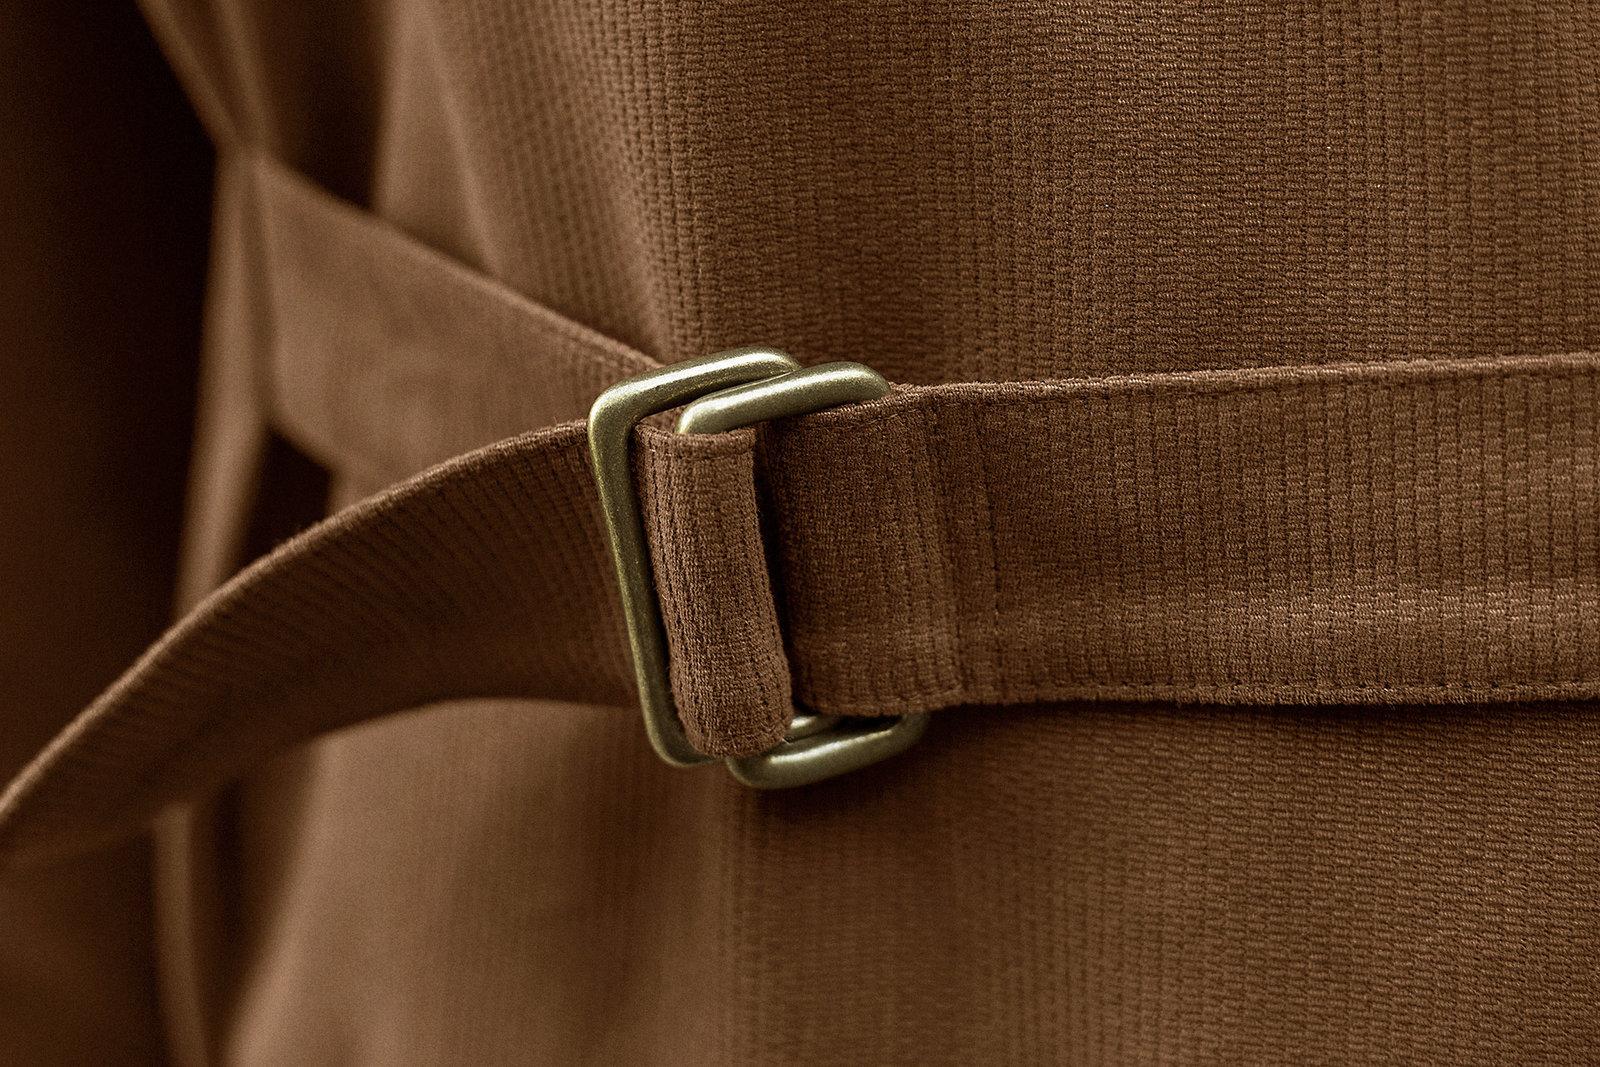 trucker-jacket-bedford-cord-rust-11@2x.jpg